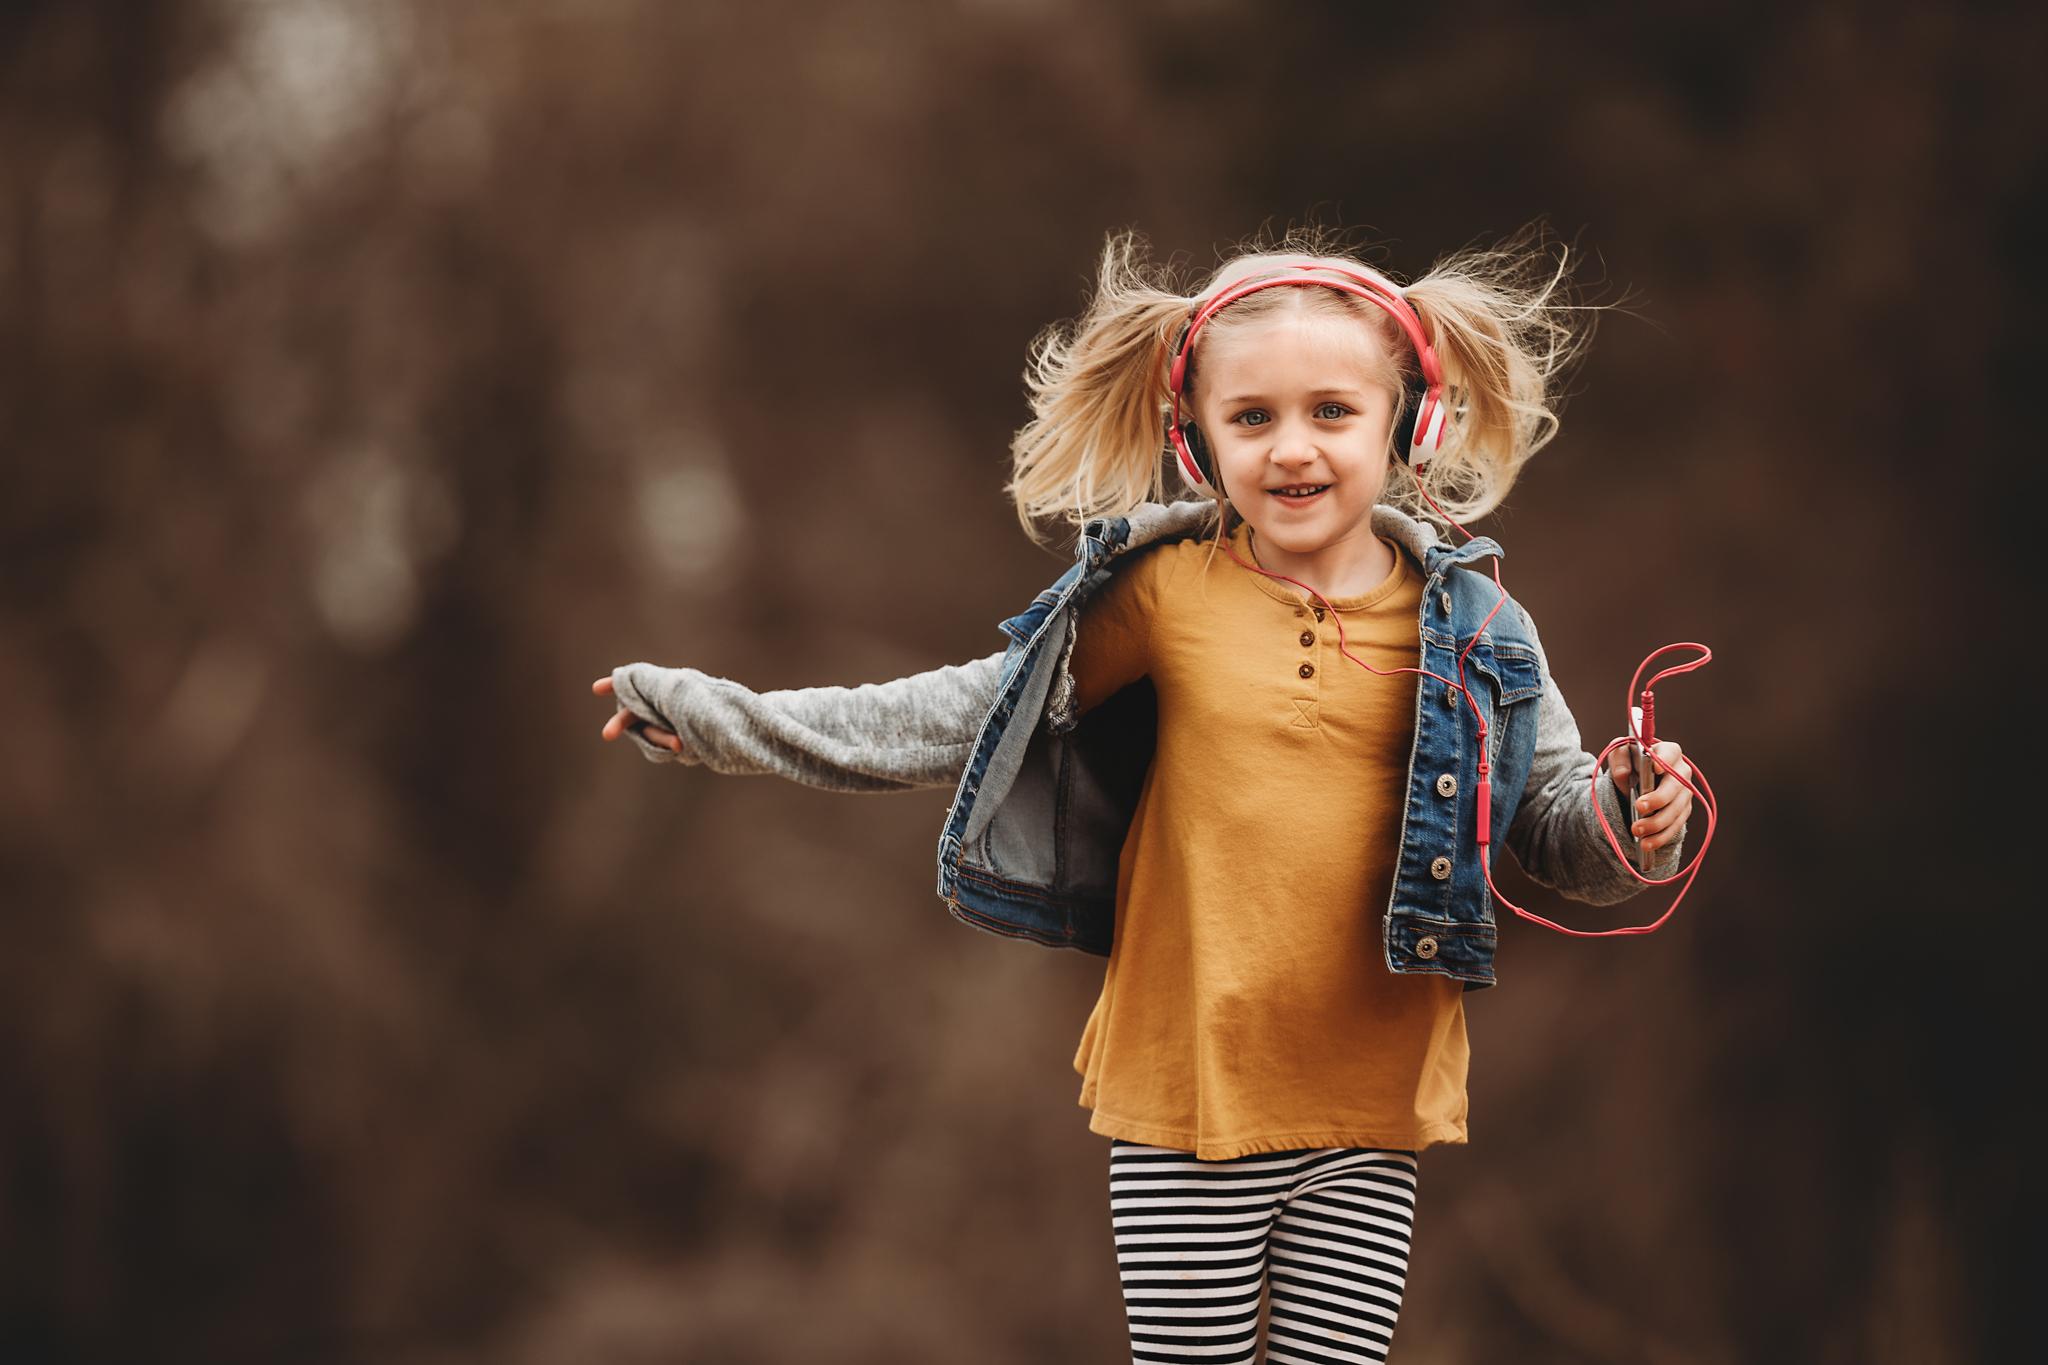 Long-island-photographer-hello-olivia-photography-children-kids-photos-new-york-lifestyle-portraits-suffolk-County-LI-37.jpg